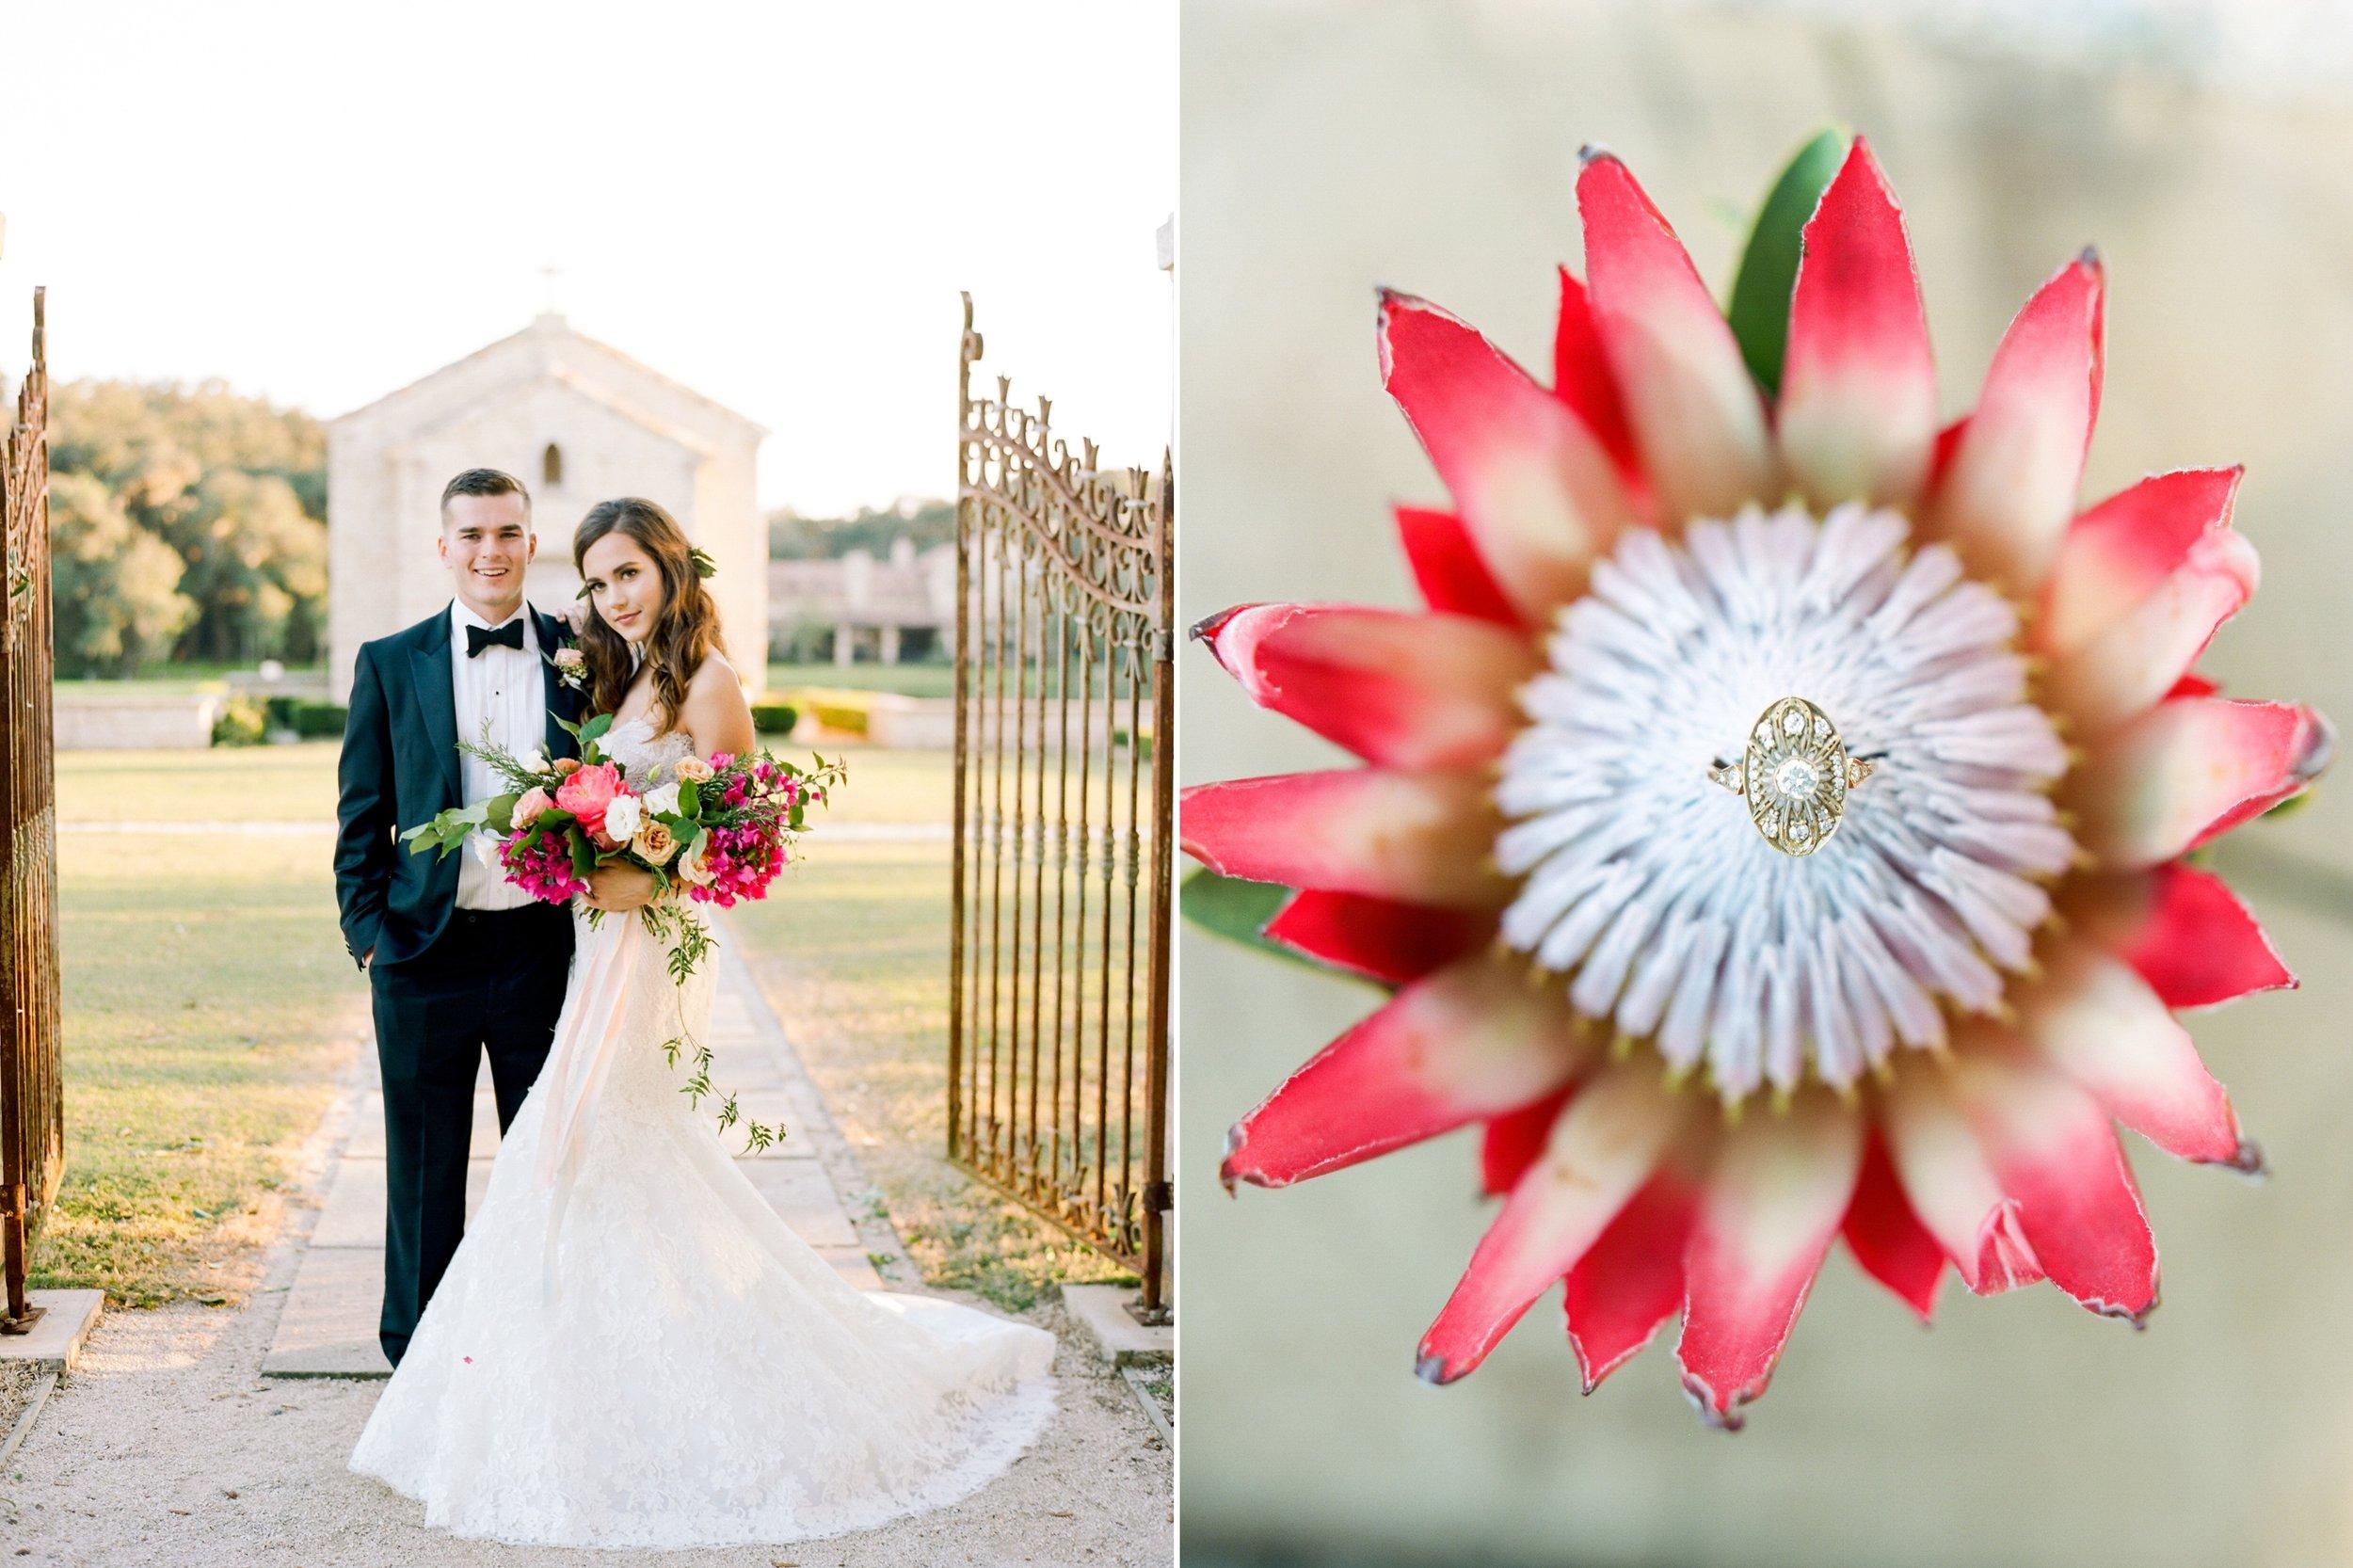 the-clubs-at-houston-oaks-wedding-houston-oaks-wedding-ceremony-houston-oaks-chapel-belle-of-the-ball-dana-fernandez-photography-houston-wedding-photographer-luxury-film-fine-art-111.jpg